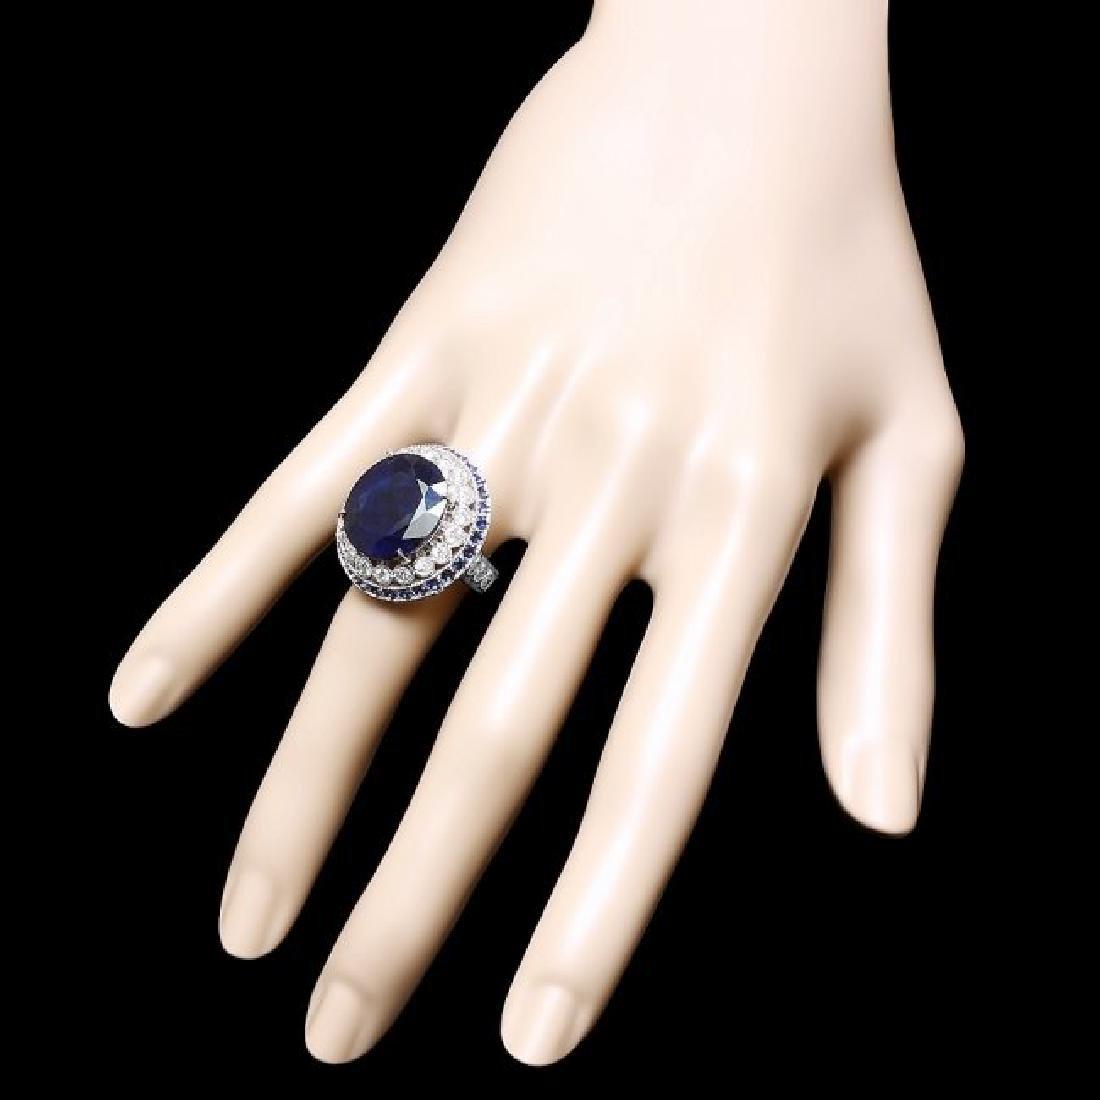 14k Gold 14.7ct Sapphire 0.80ct Diamond Ring - 3